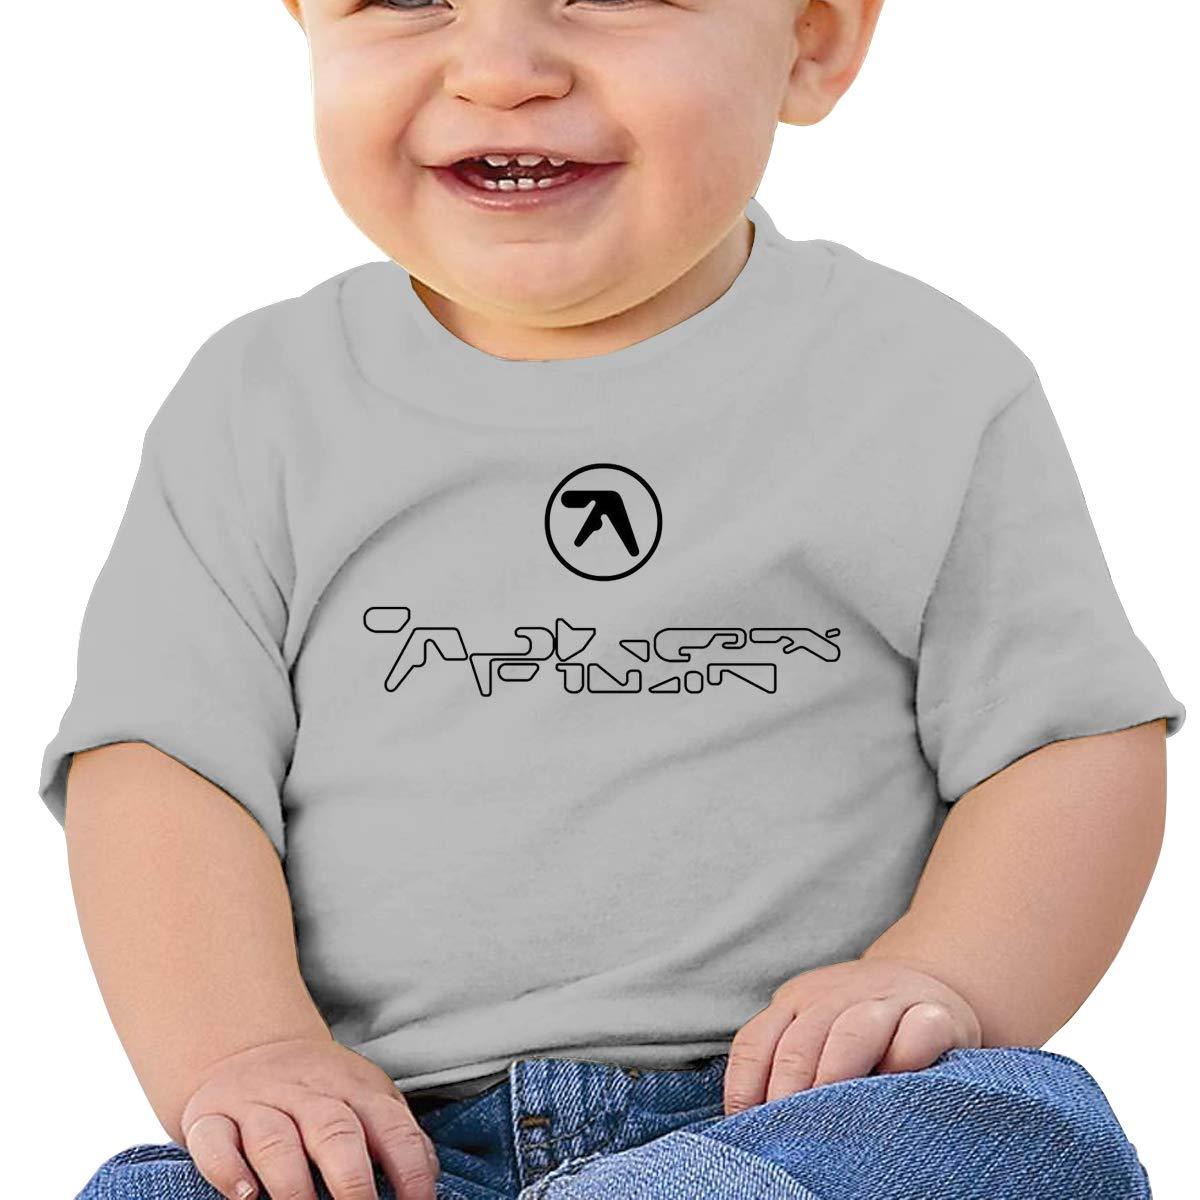 Aphex Twin Logo Toddler Short-Sleeve Tee for Boy Girl Infant Kids T-Shirt On Newborn 6-18 Months